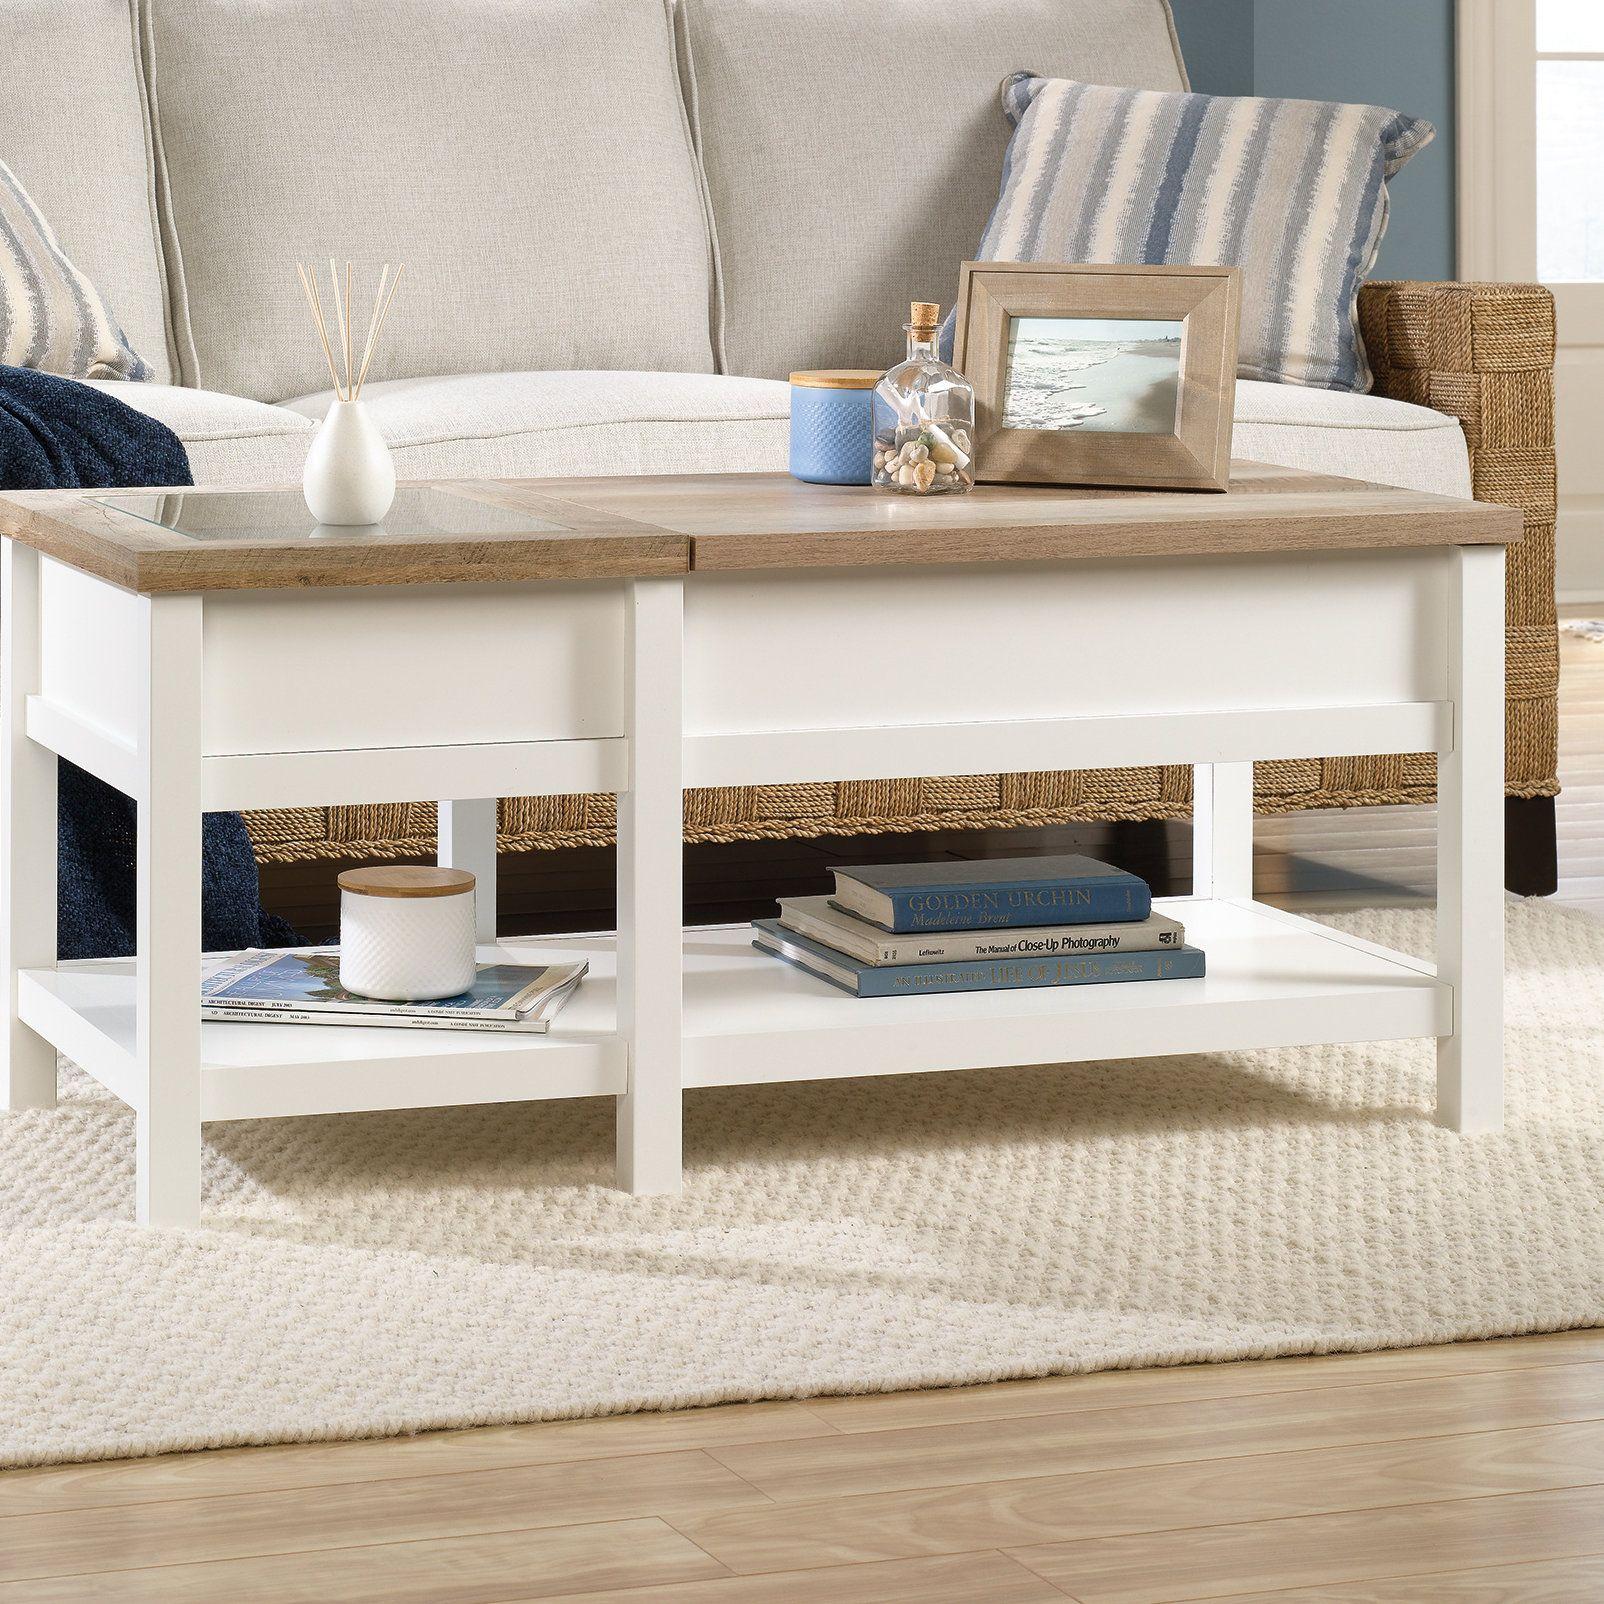 Myrasol Lift Top Extendable Frame Coffee Table With Storage Coffee Table Lift Top Coffee Table Coffee Table With Storage [ 1604 x 1604 Pixel ]